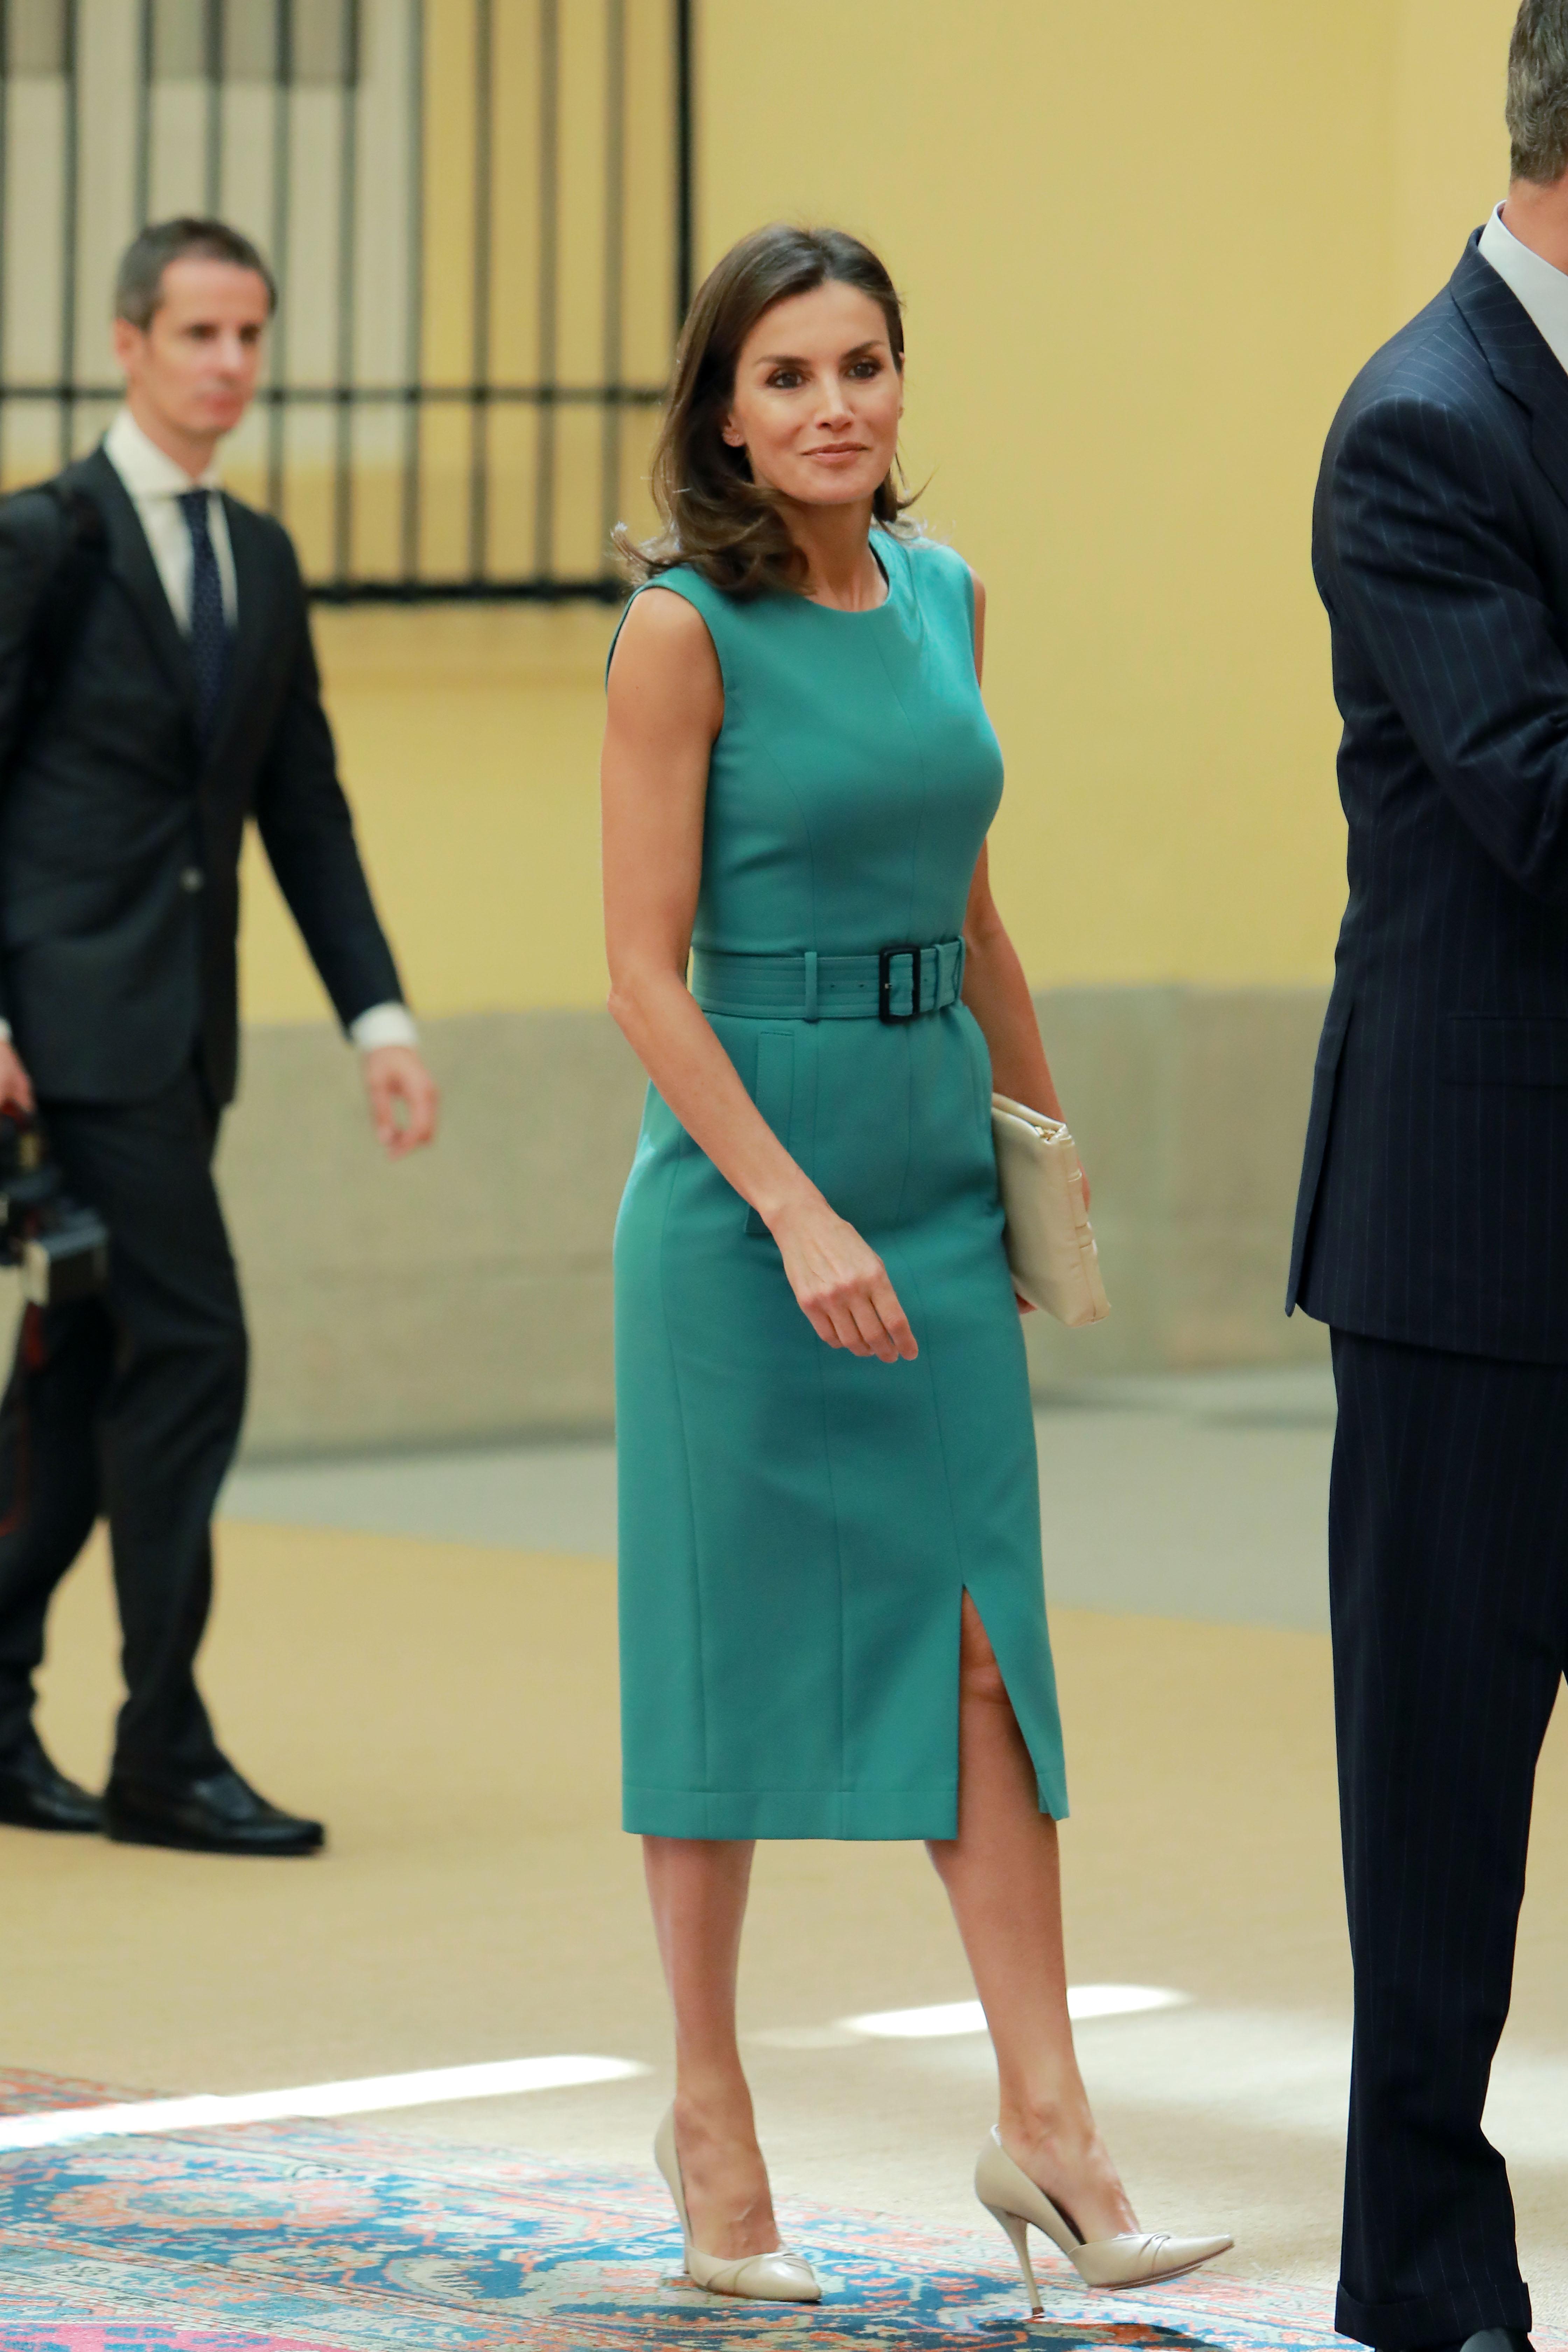 Spanish Royals Attend A Meeting With Members Of 'Princesa De Asturias' Foundation